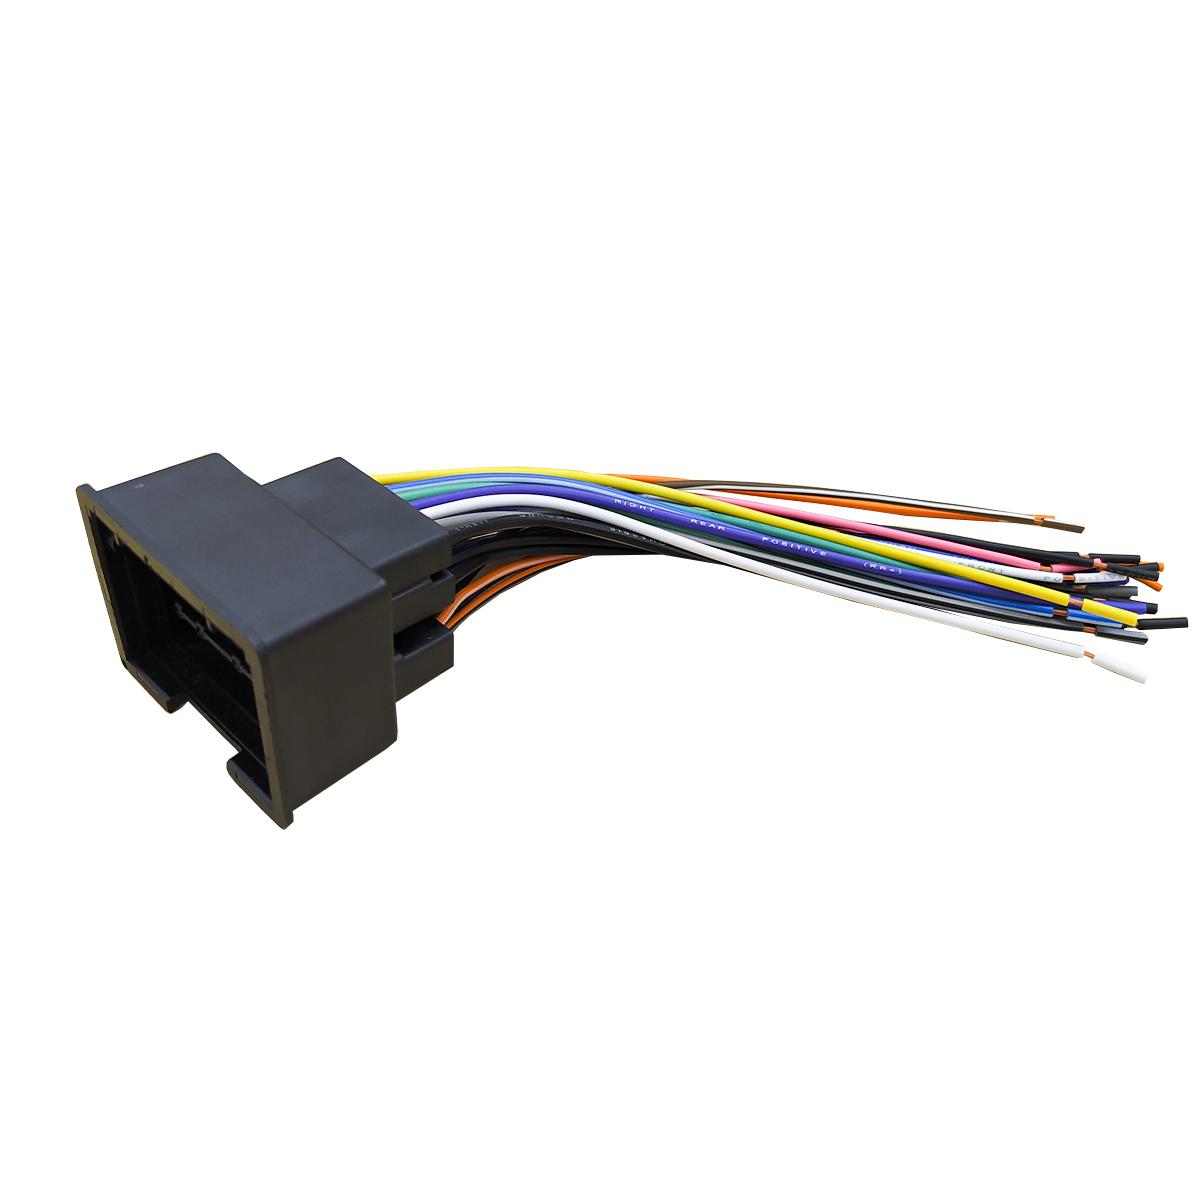 Chicote Plug Adaptador Cd Conector Onix Cobalt Prisma 2012